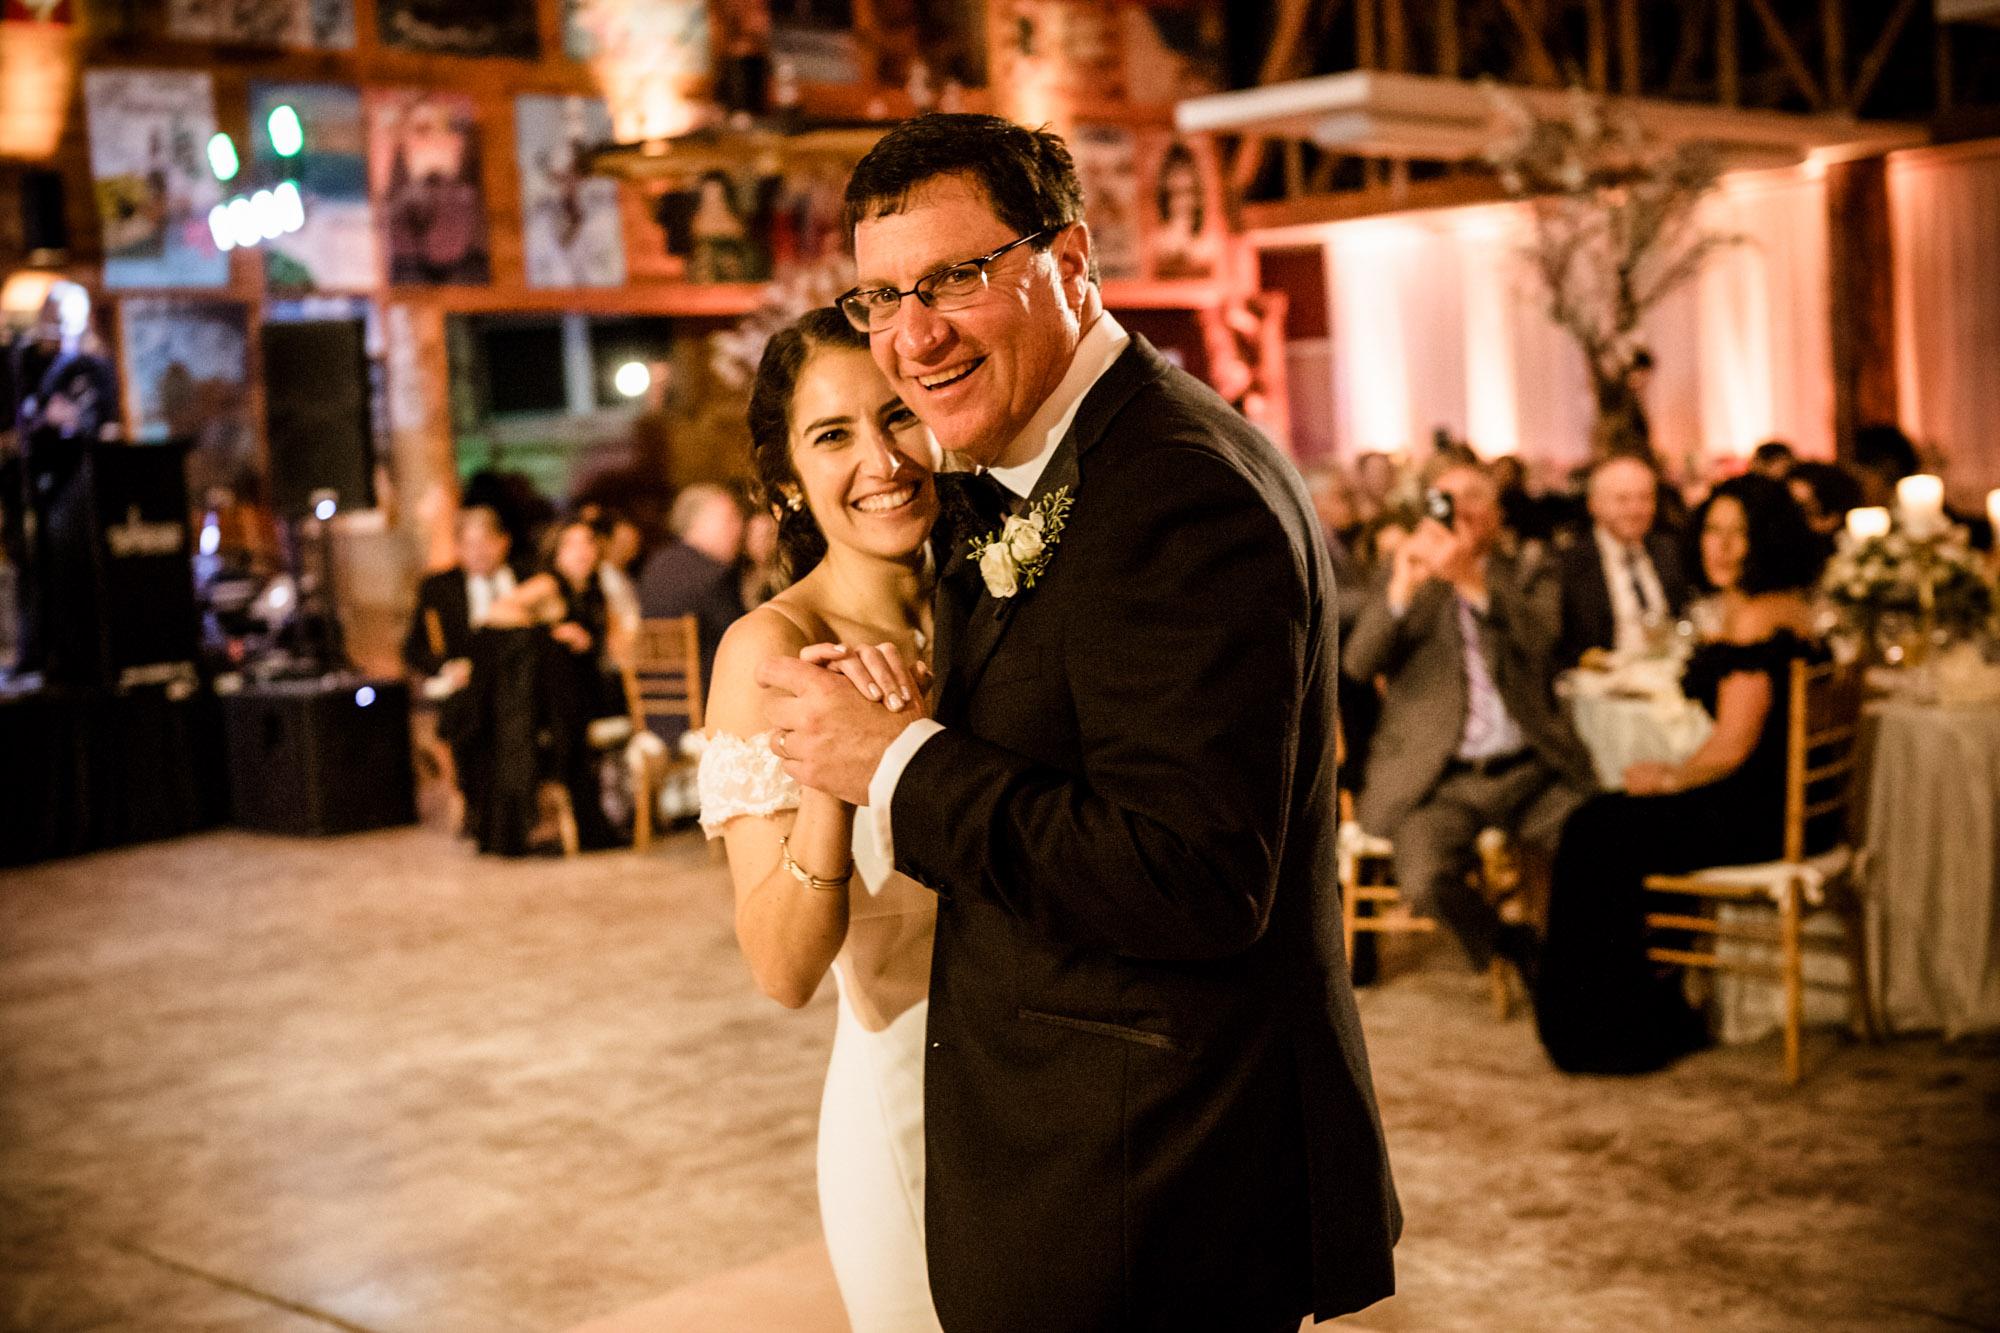 scranton_wedding_photographer_lettieri_pa (31 of 34).jpg